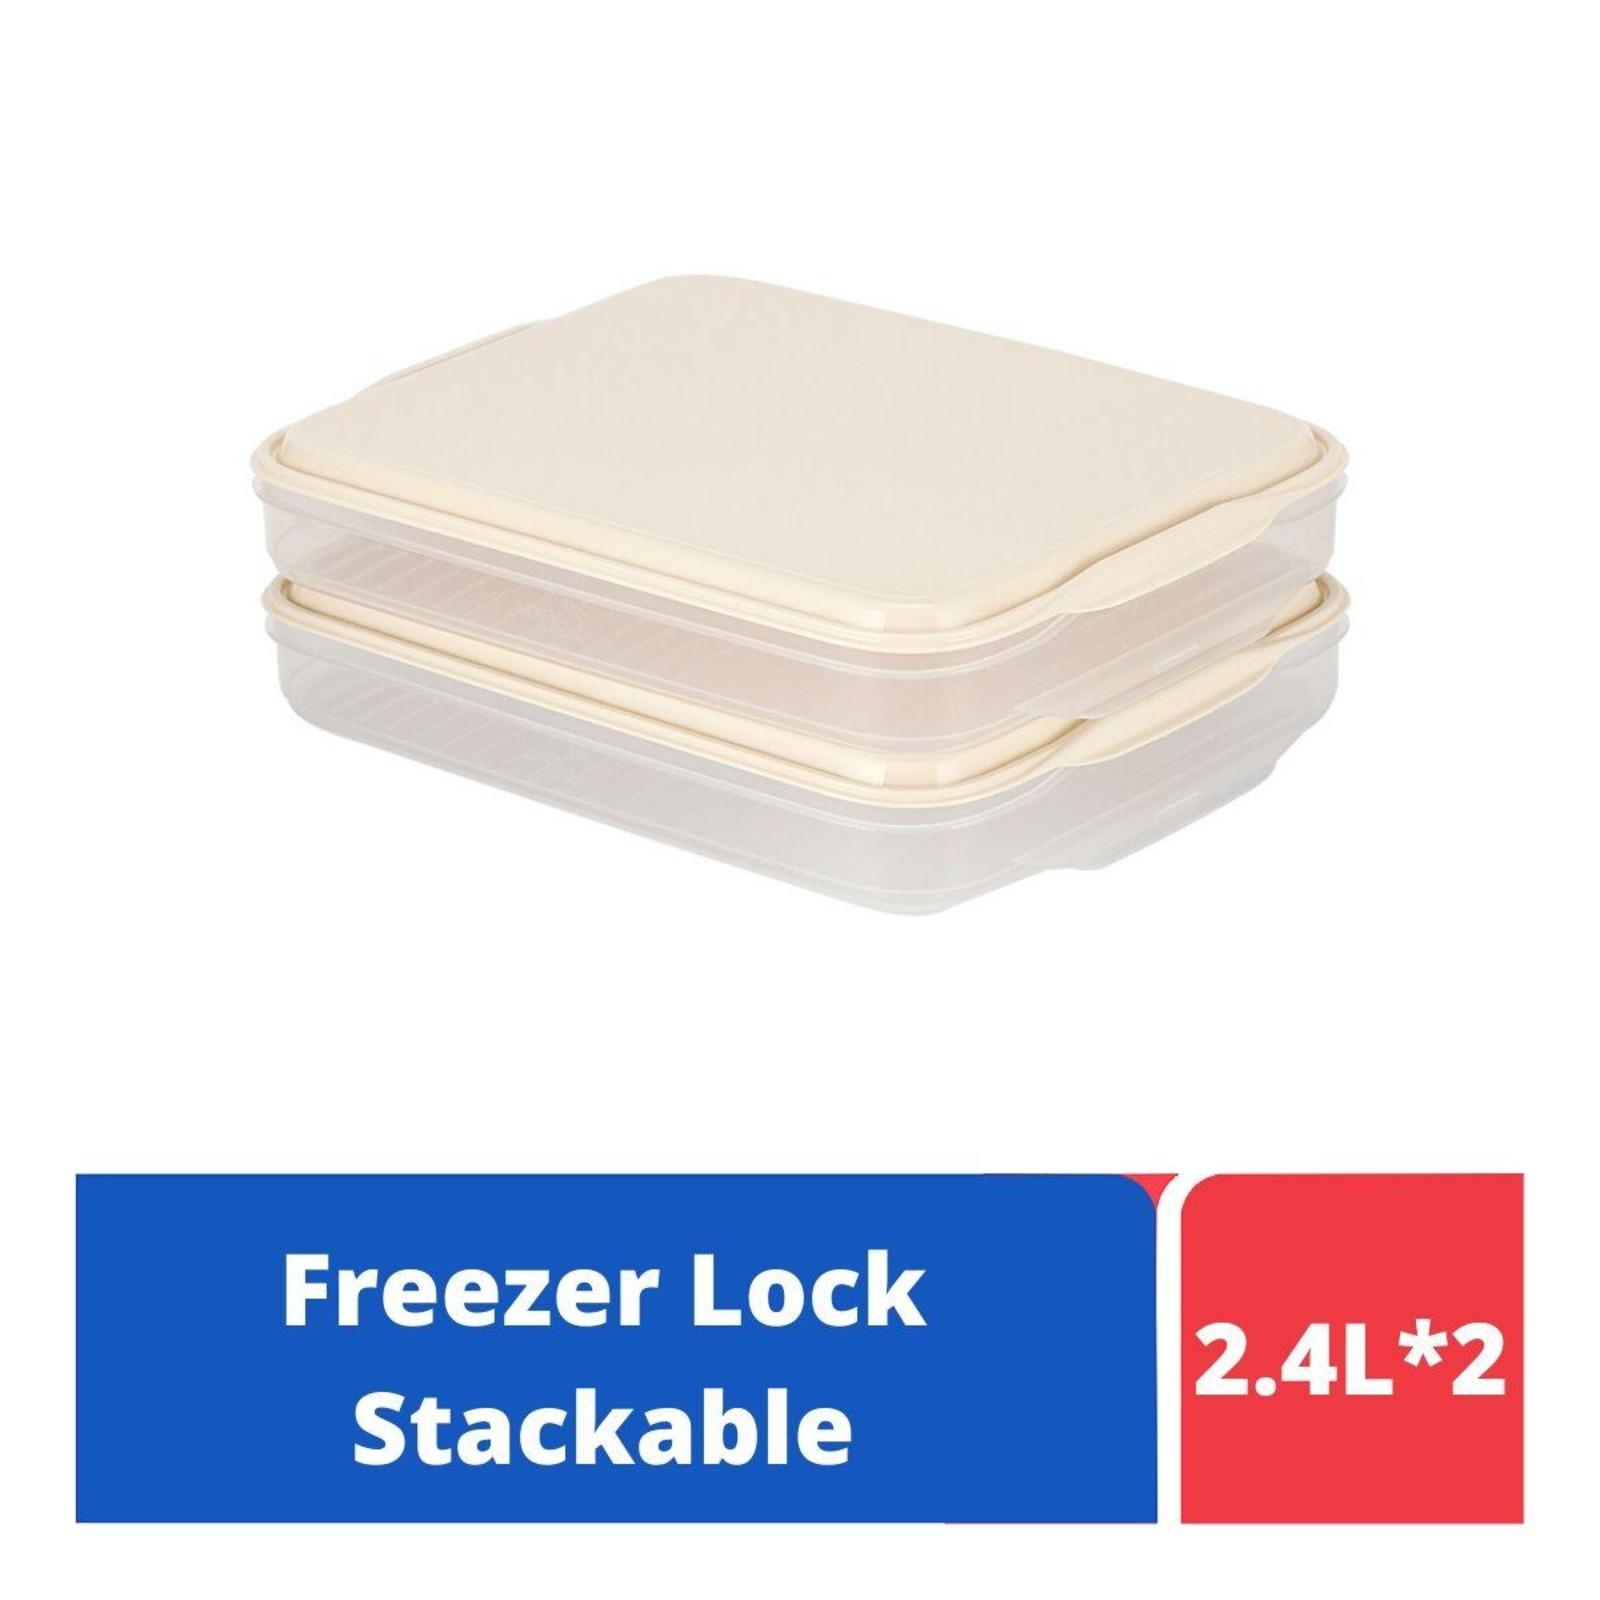 LOCK&LOCK Freezer Lock Container 2P Set Rect 2.4L - Ivory